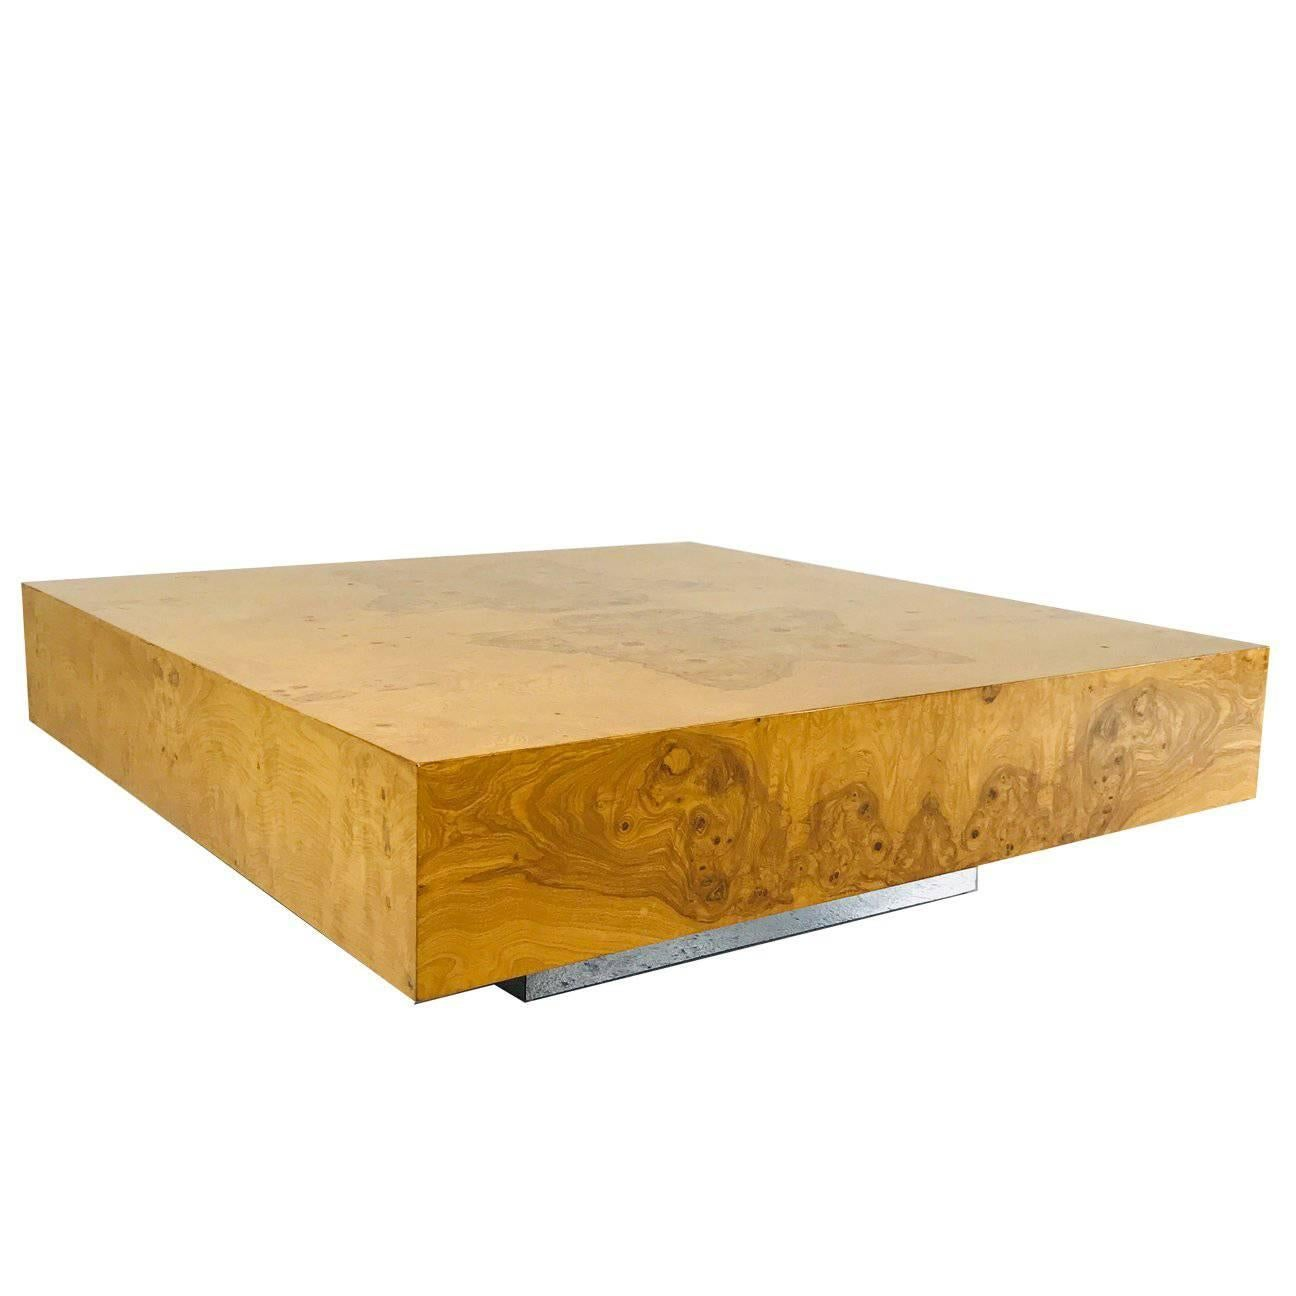 Milo Baughman Burl Wood Coffee Table With Plinth Base For Sale